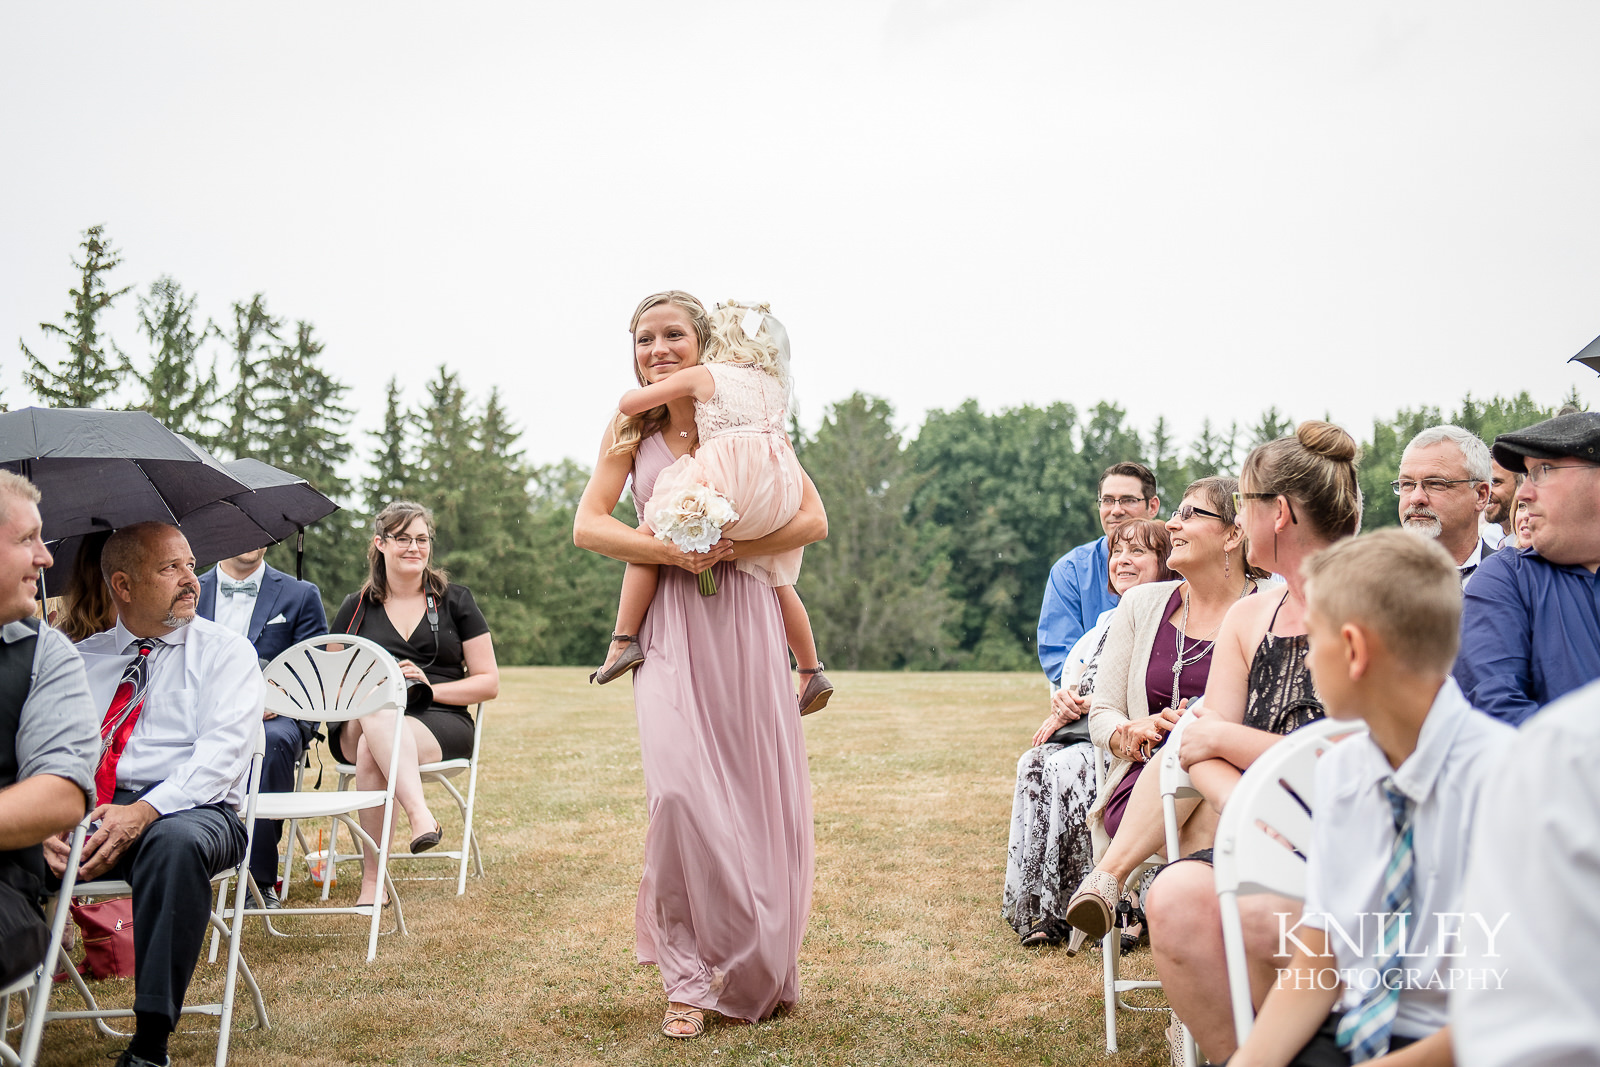 038 - Ontario Golf Club Wedding Pictures - XT2B8160.jpg